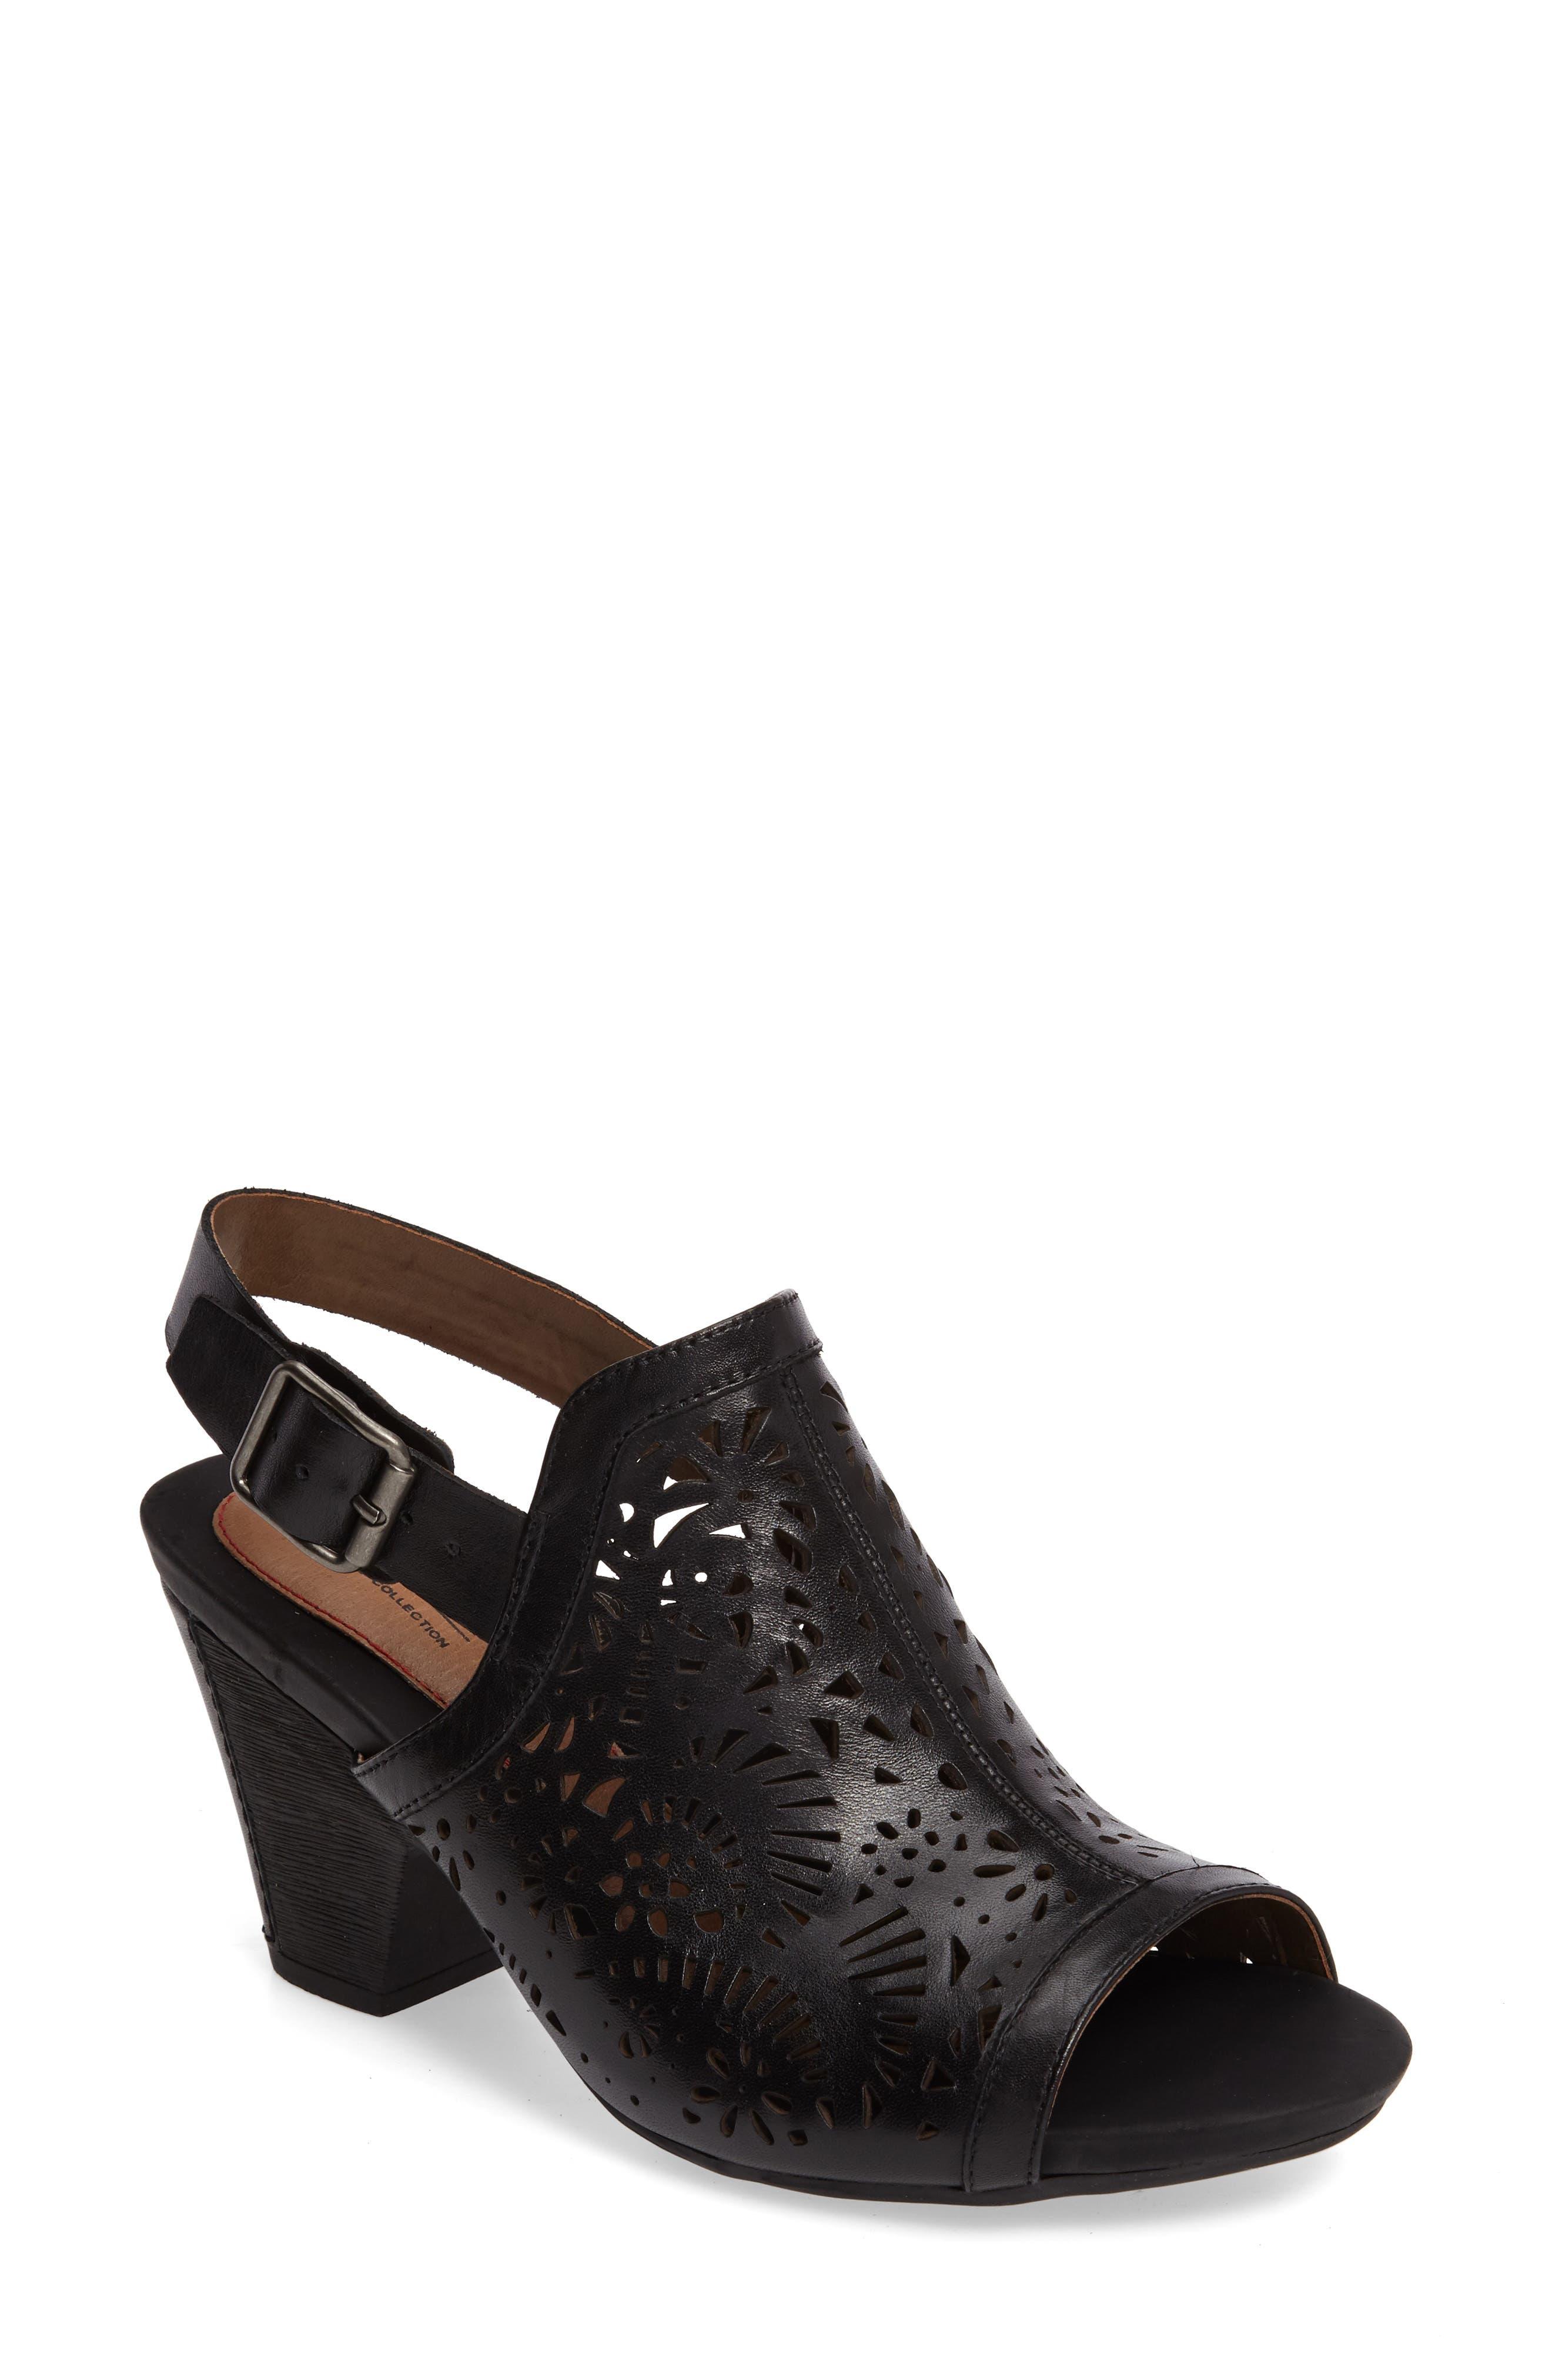 Tropez Block Heel Sandal,                         Main,                         color,